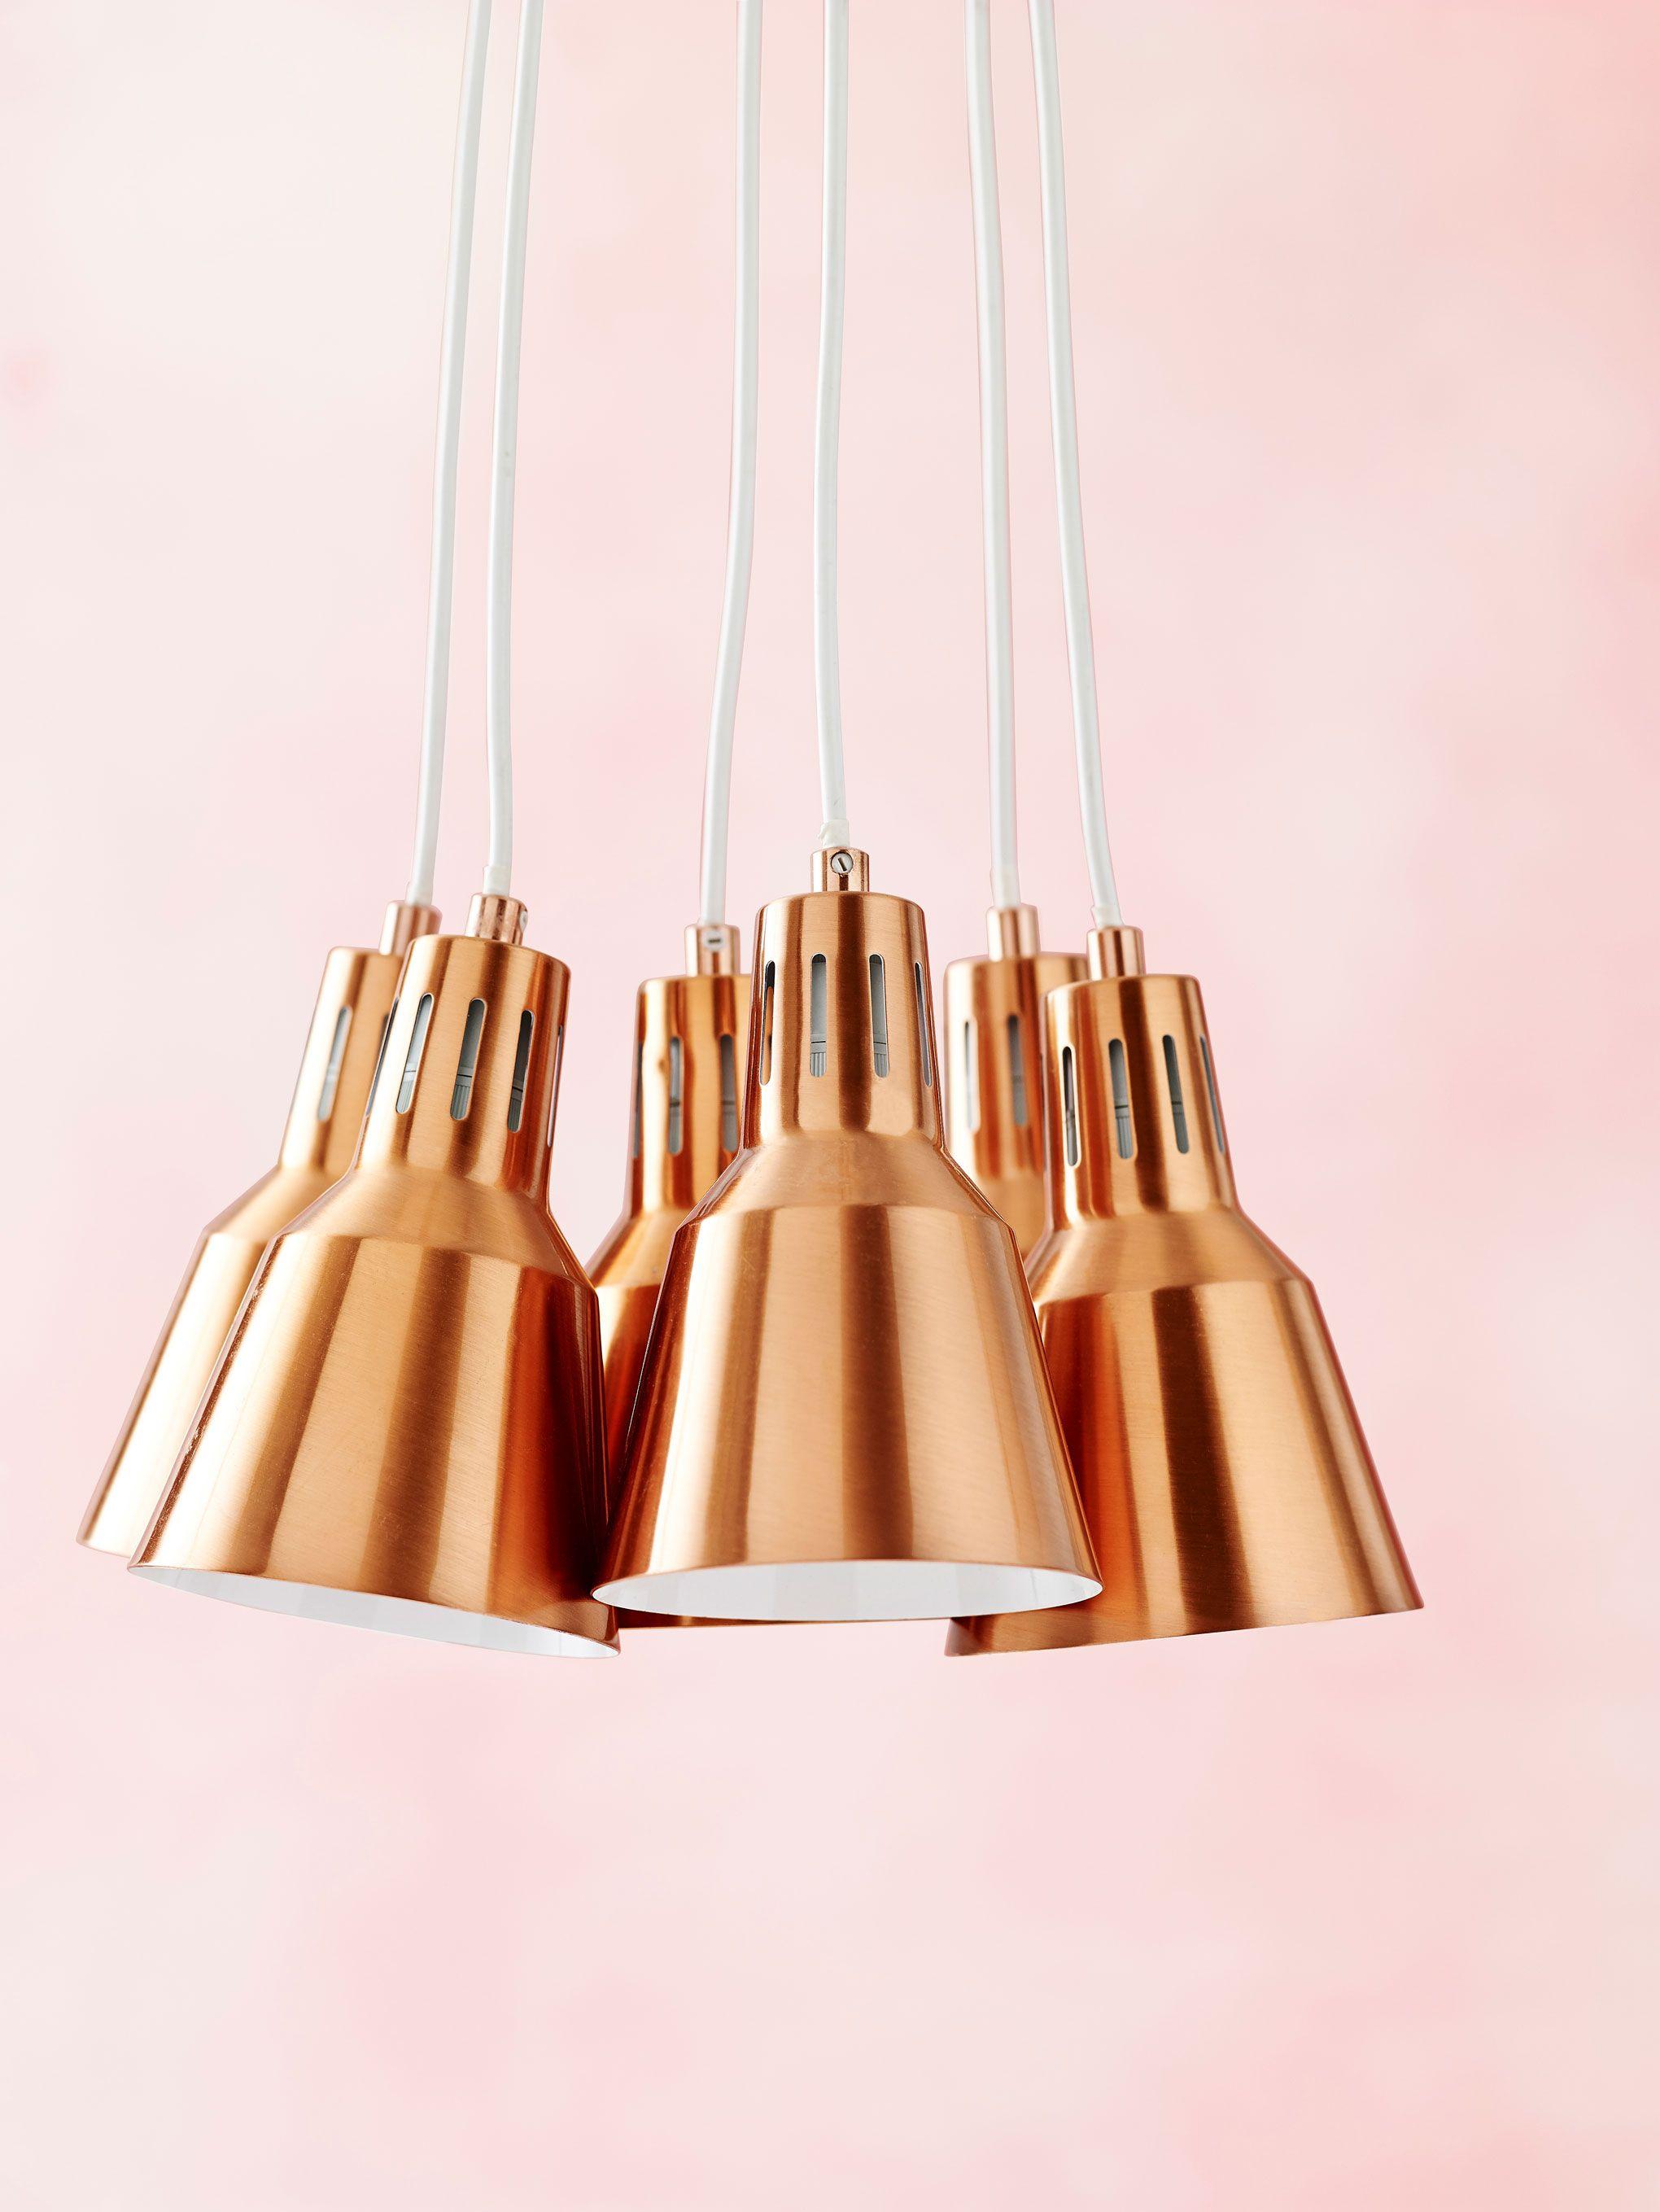 Telegraph Lighting Pendant Set In Copper Available At Domayne Australia